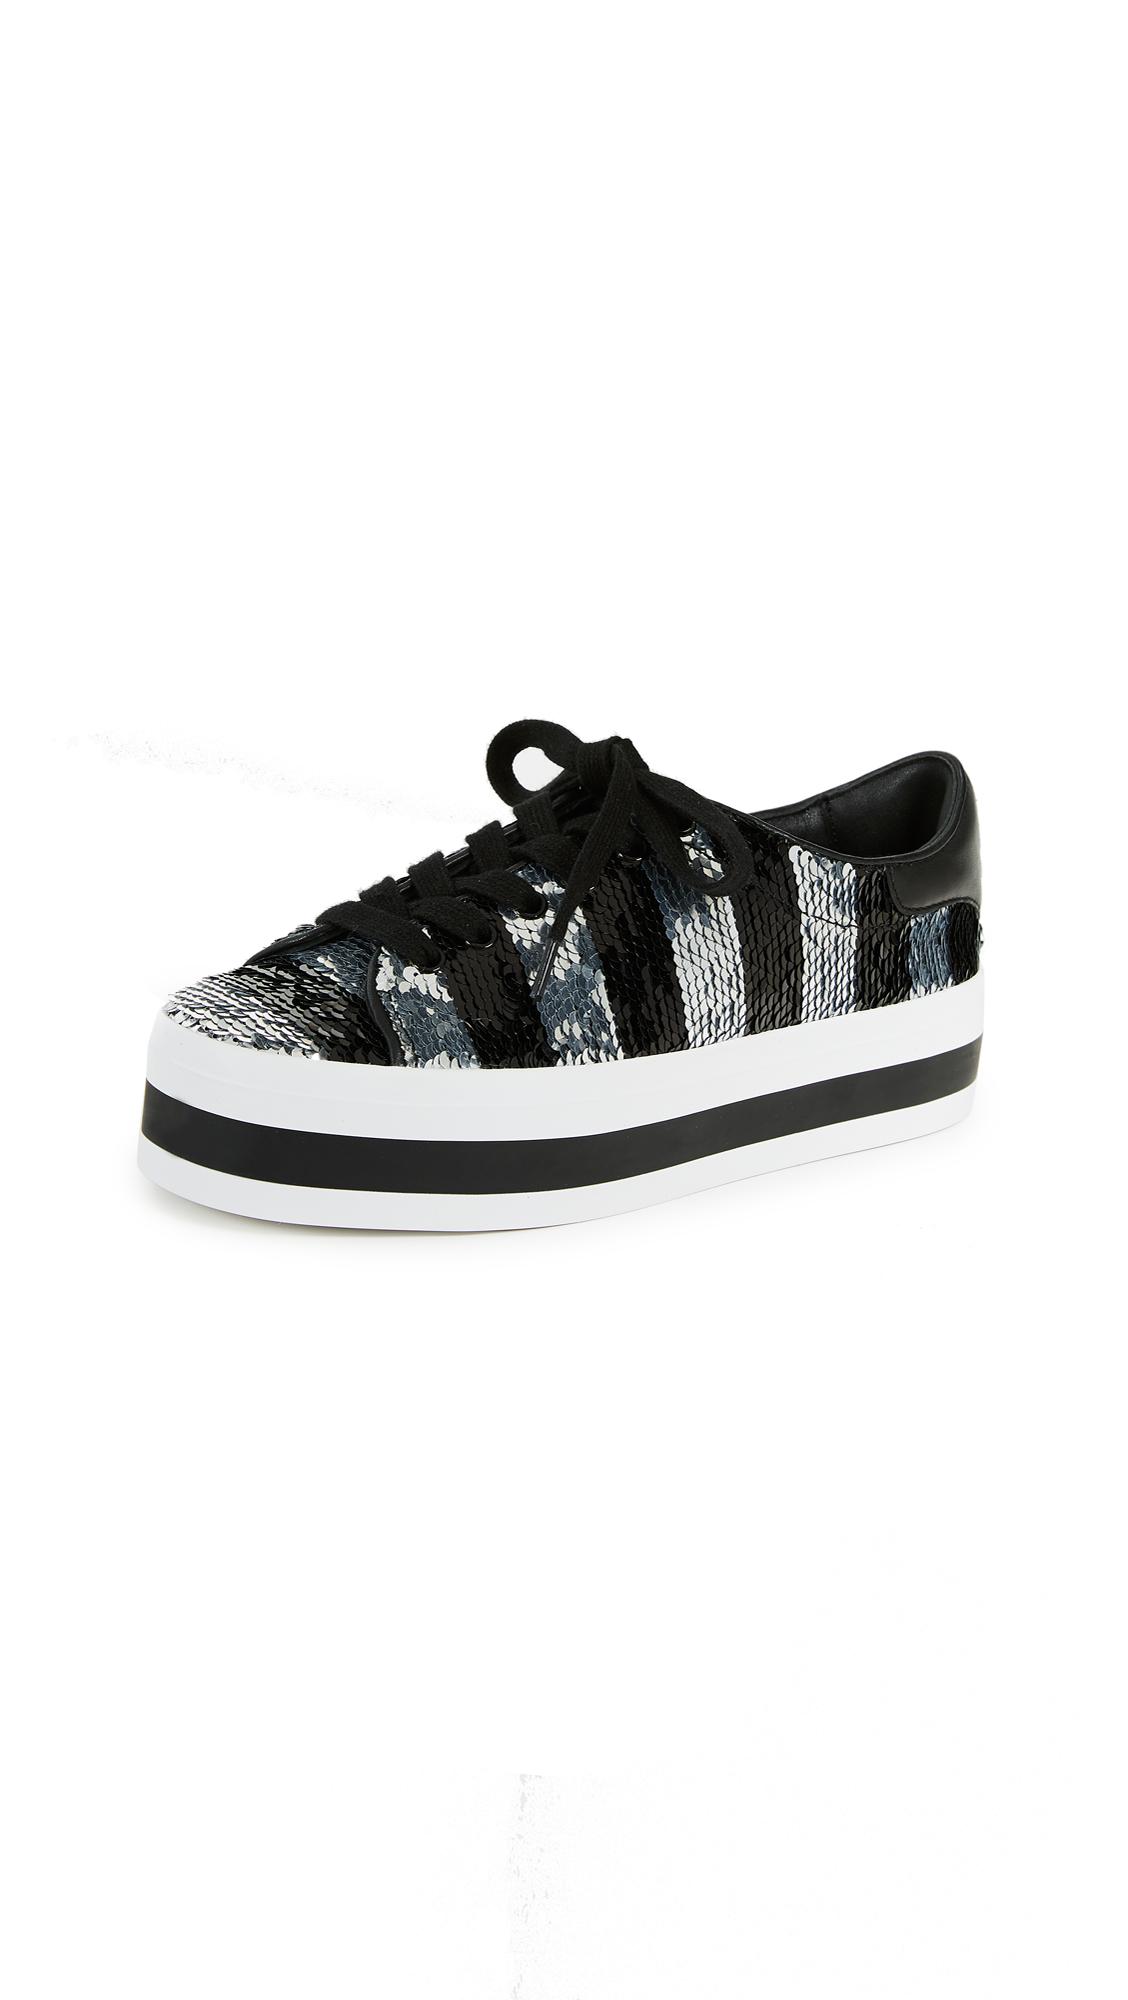 alice + olivia Ezra Glitter Sneakers - Black/Silver